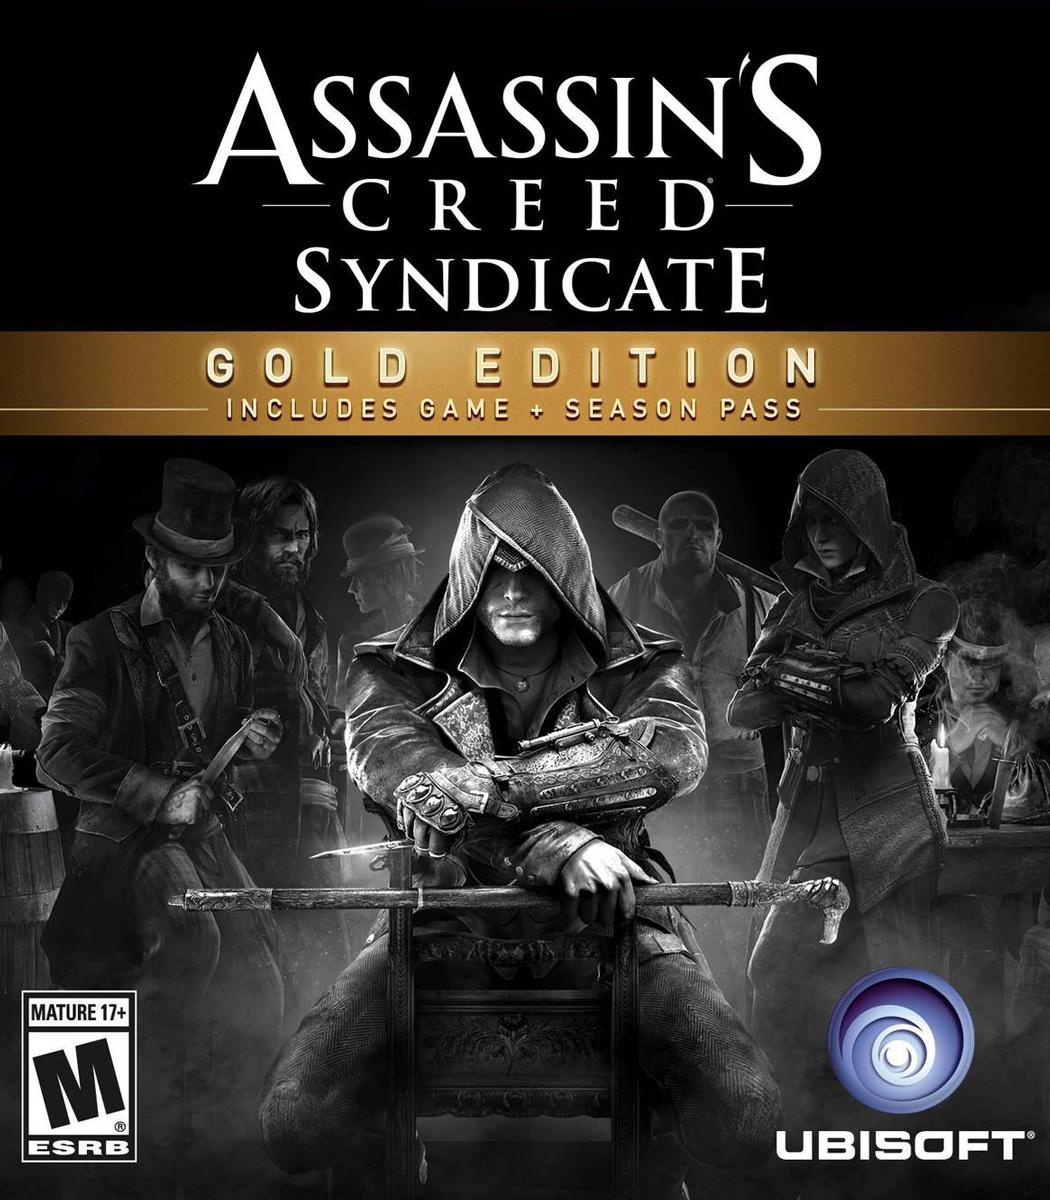 Assassins Creed Syndicate. Gold Edition, Ubisoft Quebec,Ubisoft Entertainment